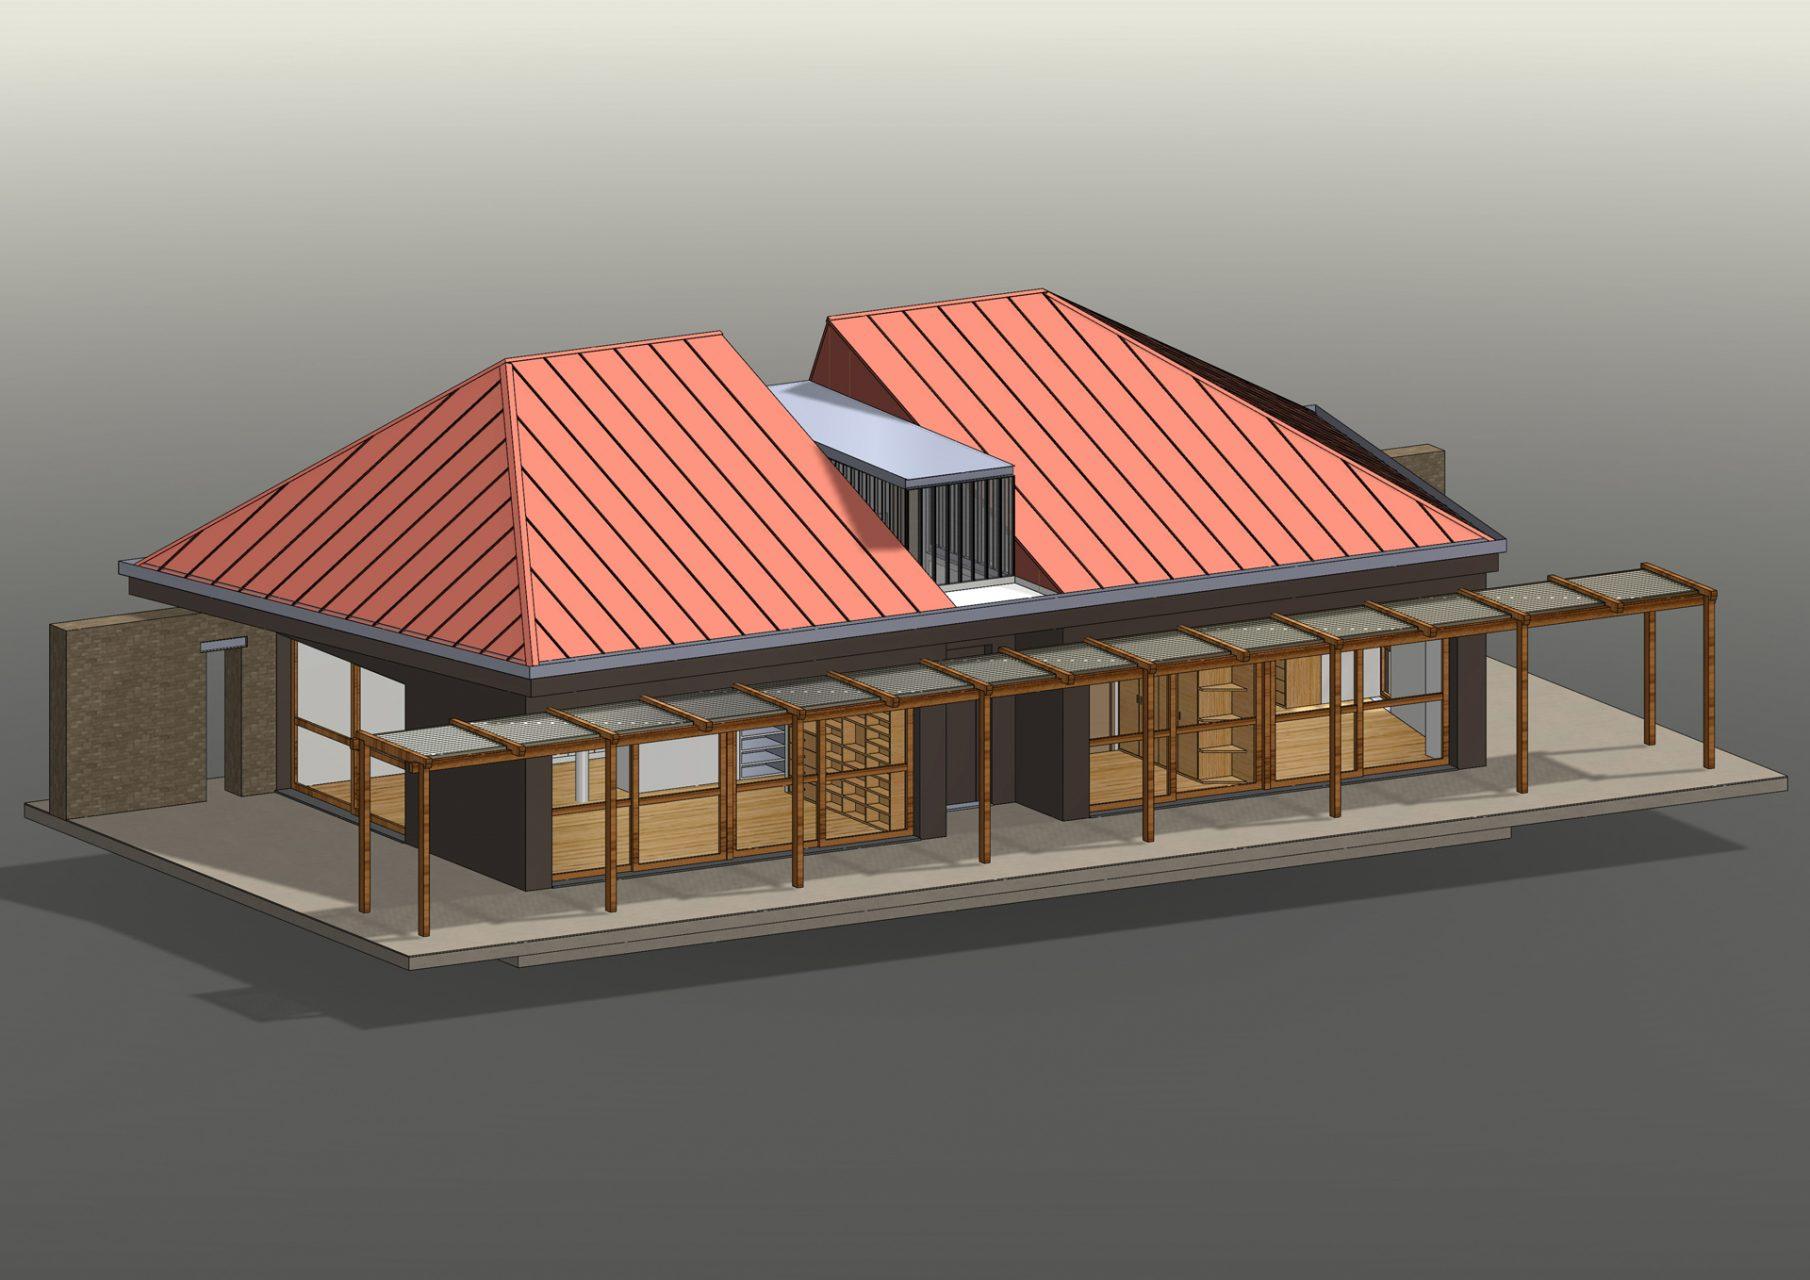 KL HOUSE 06 - axonometric view exterior F